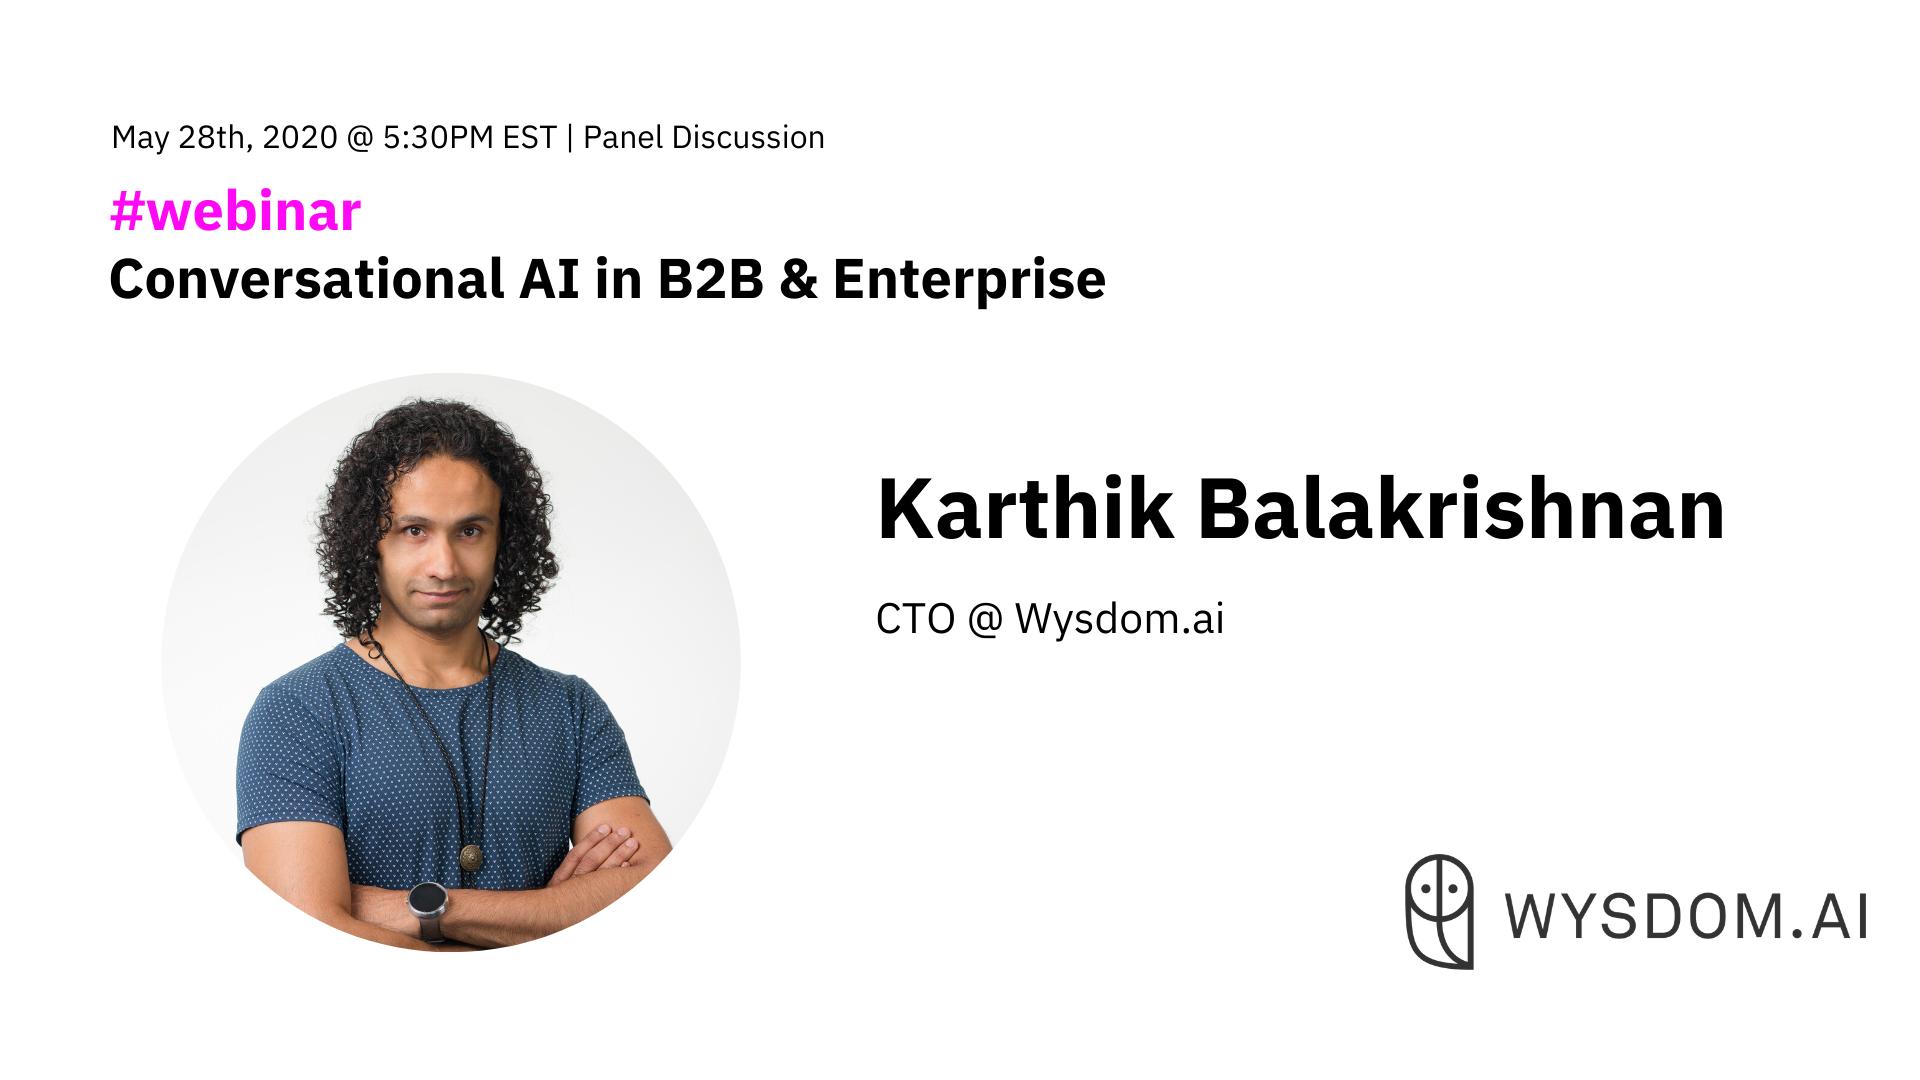 Meet Our Speaker: Kharthik Balakrishnan